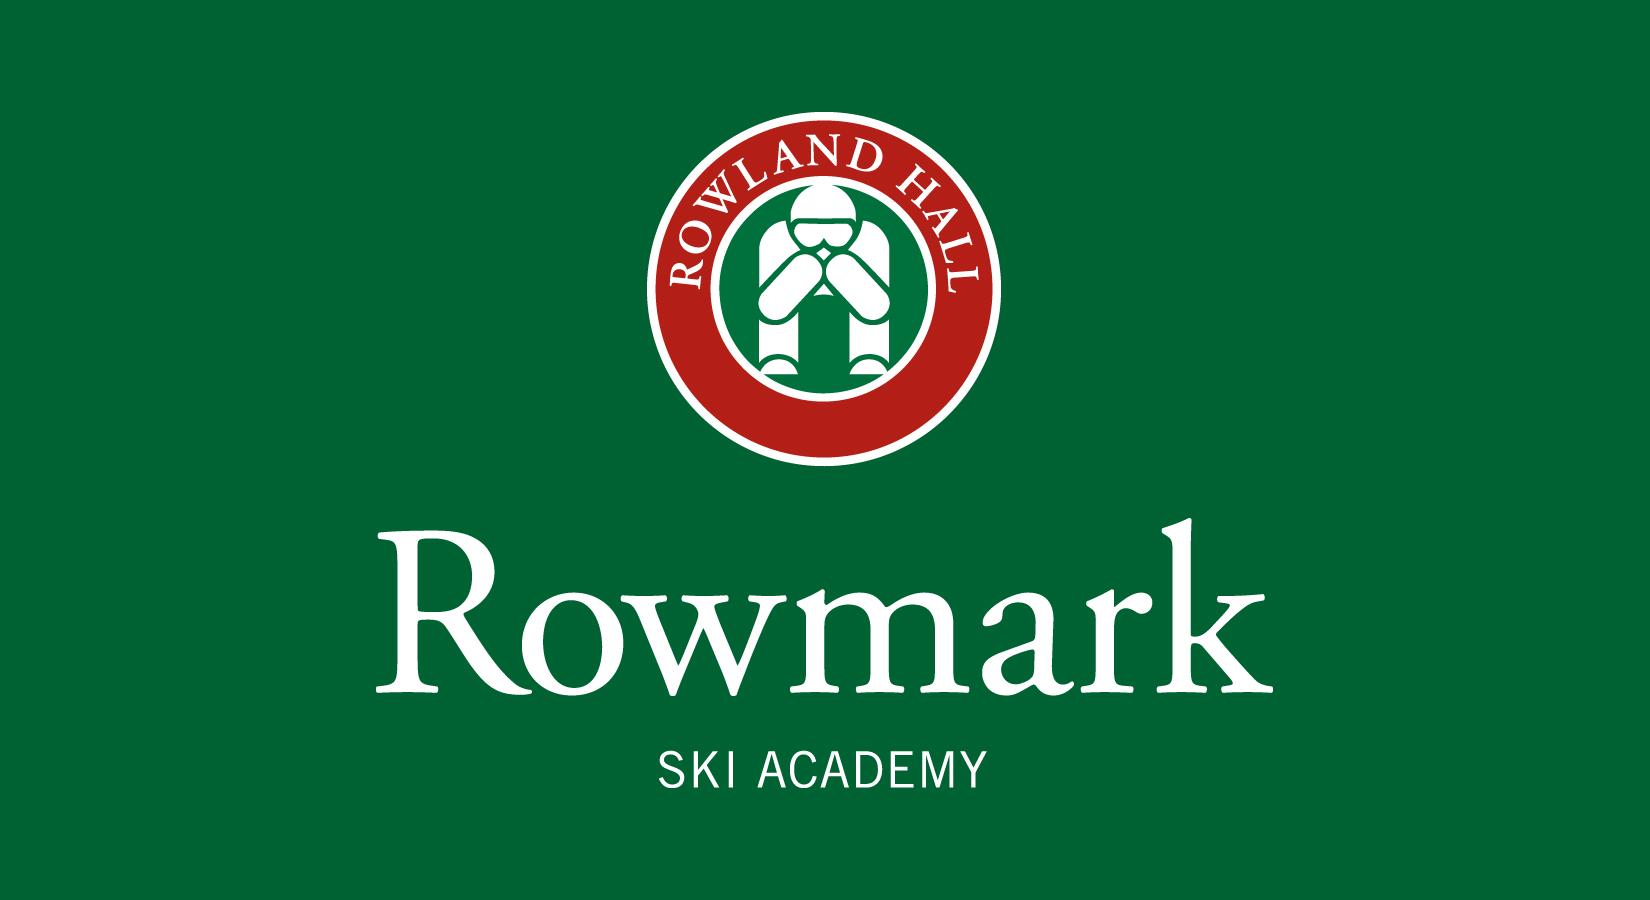 RowmarkSkiAcademy.jpg